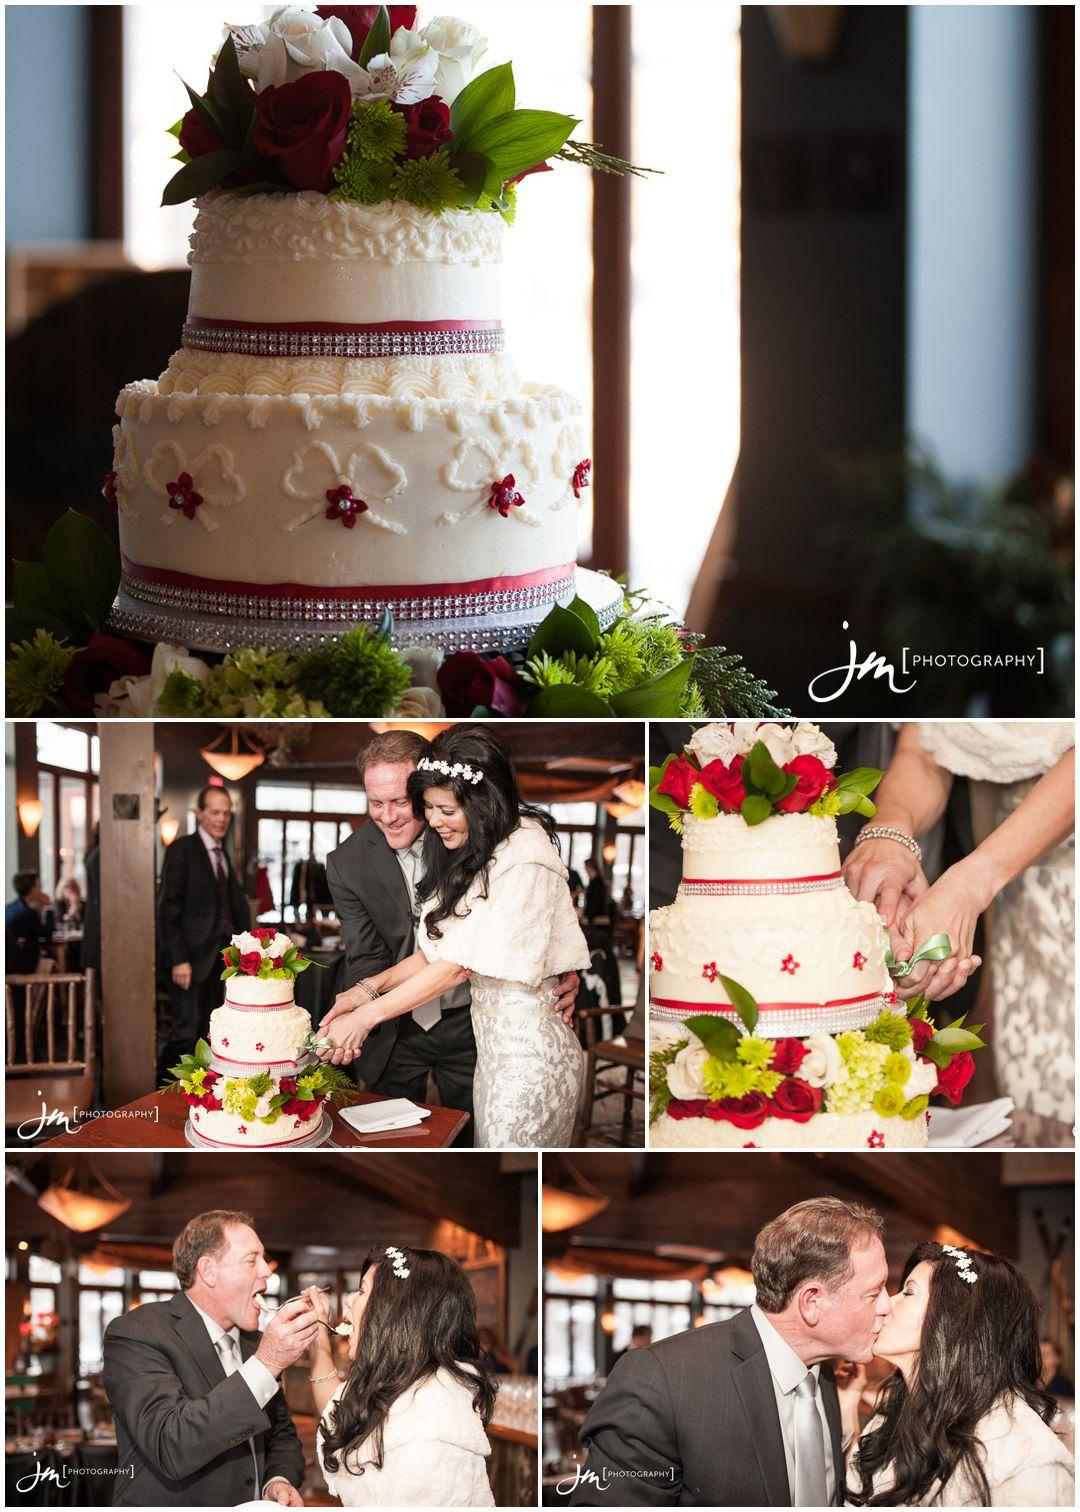 151229_7106-Calgary-Wedding-Photographers-River-Cafe-Princes-Island-Park-JM_Photography